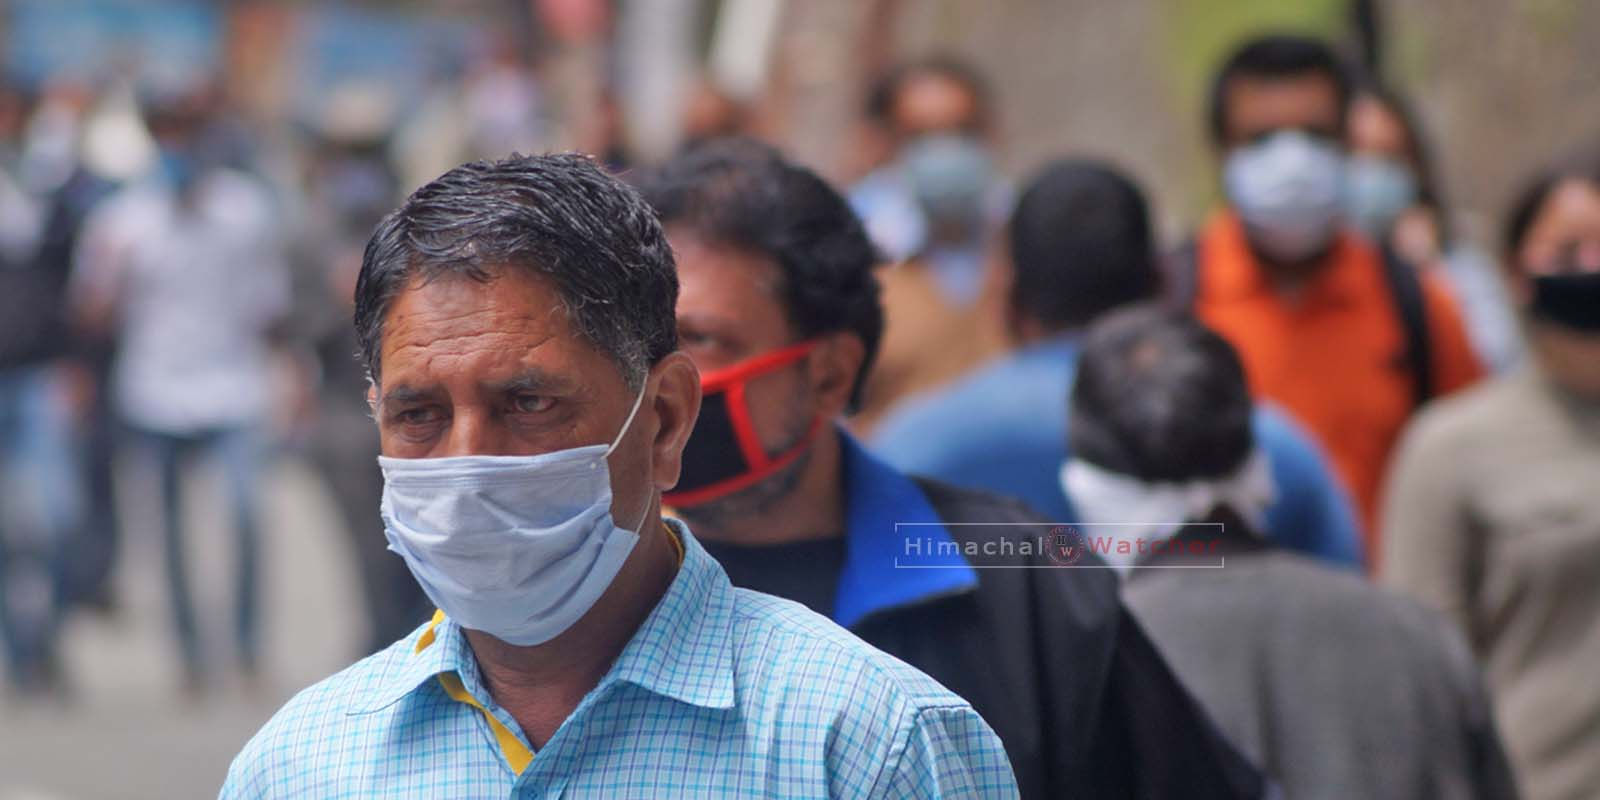 Himachal pradesh covid case on june 23